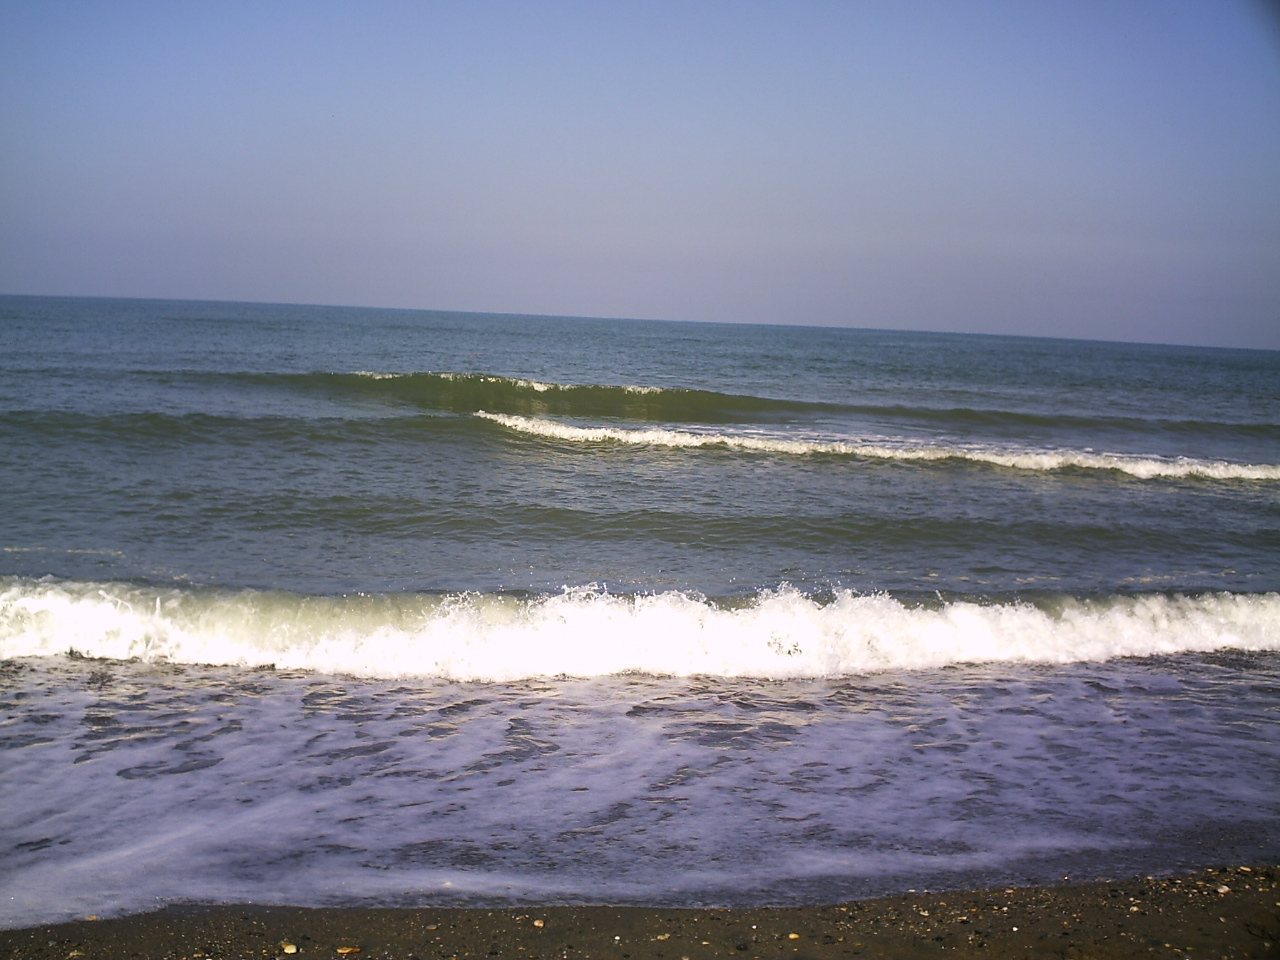 File:Amol-beach-(iran-Caspian-Sea)2005-12-2.JPG